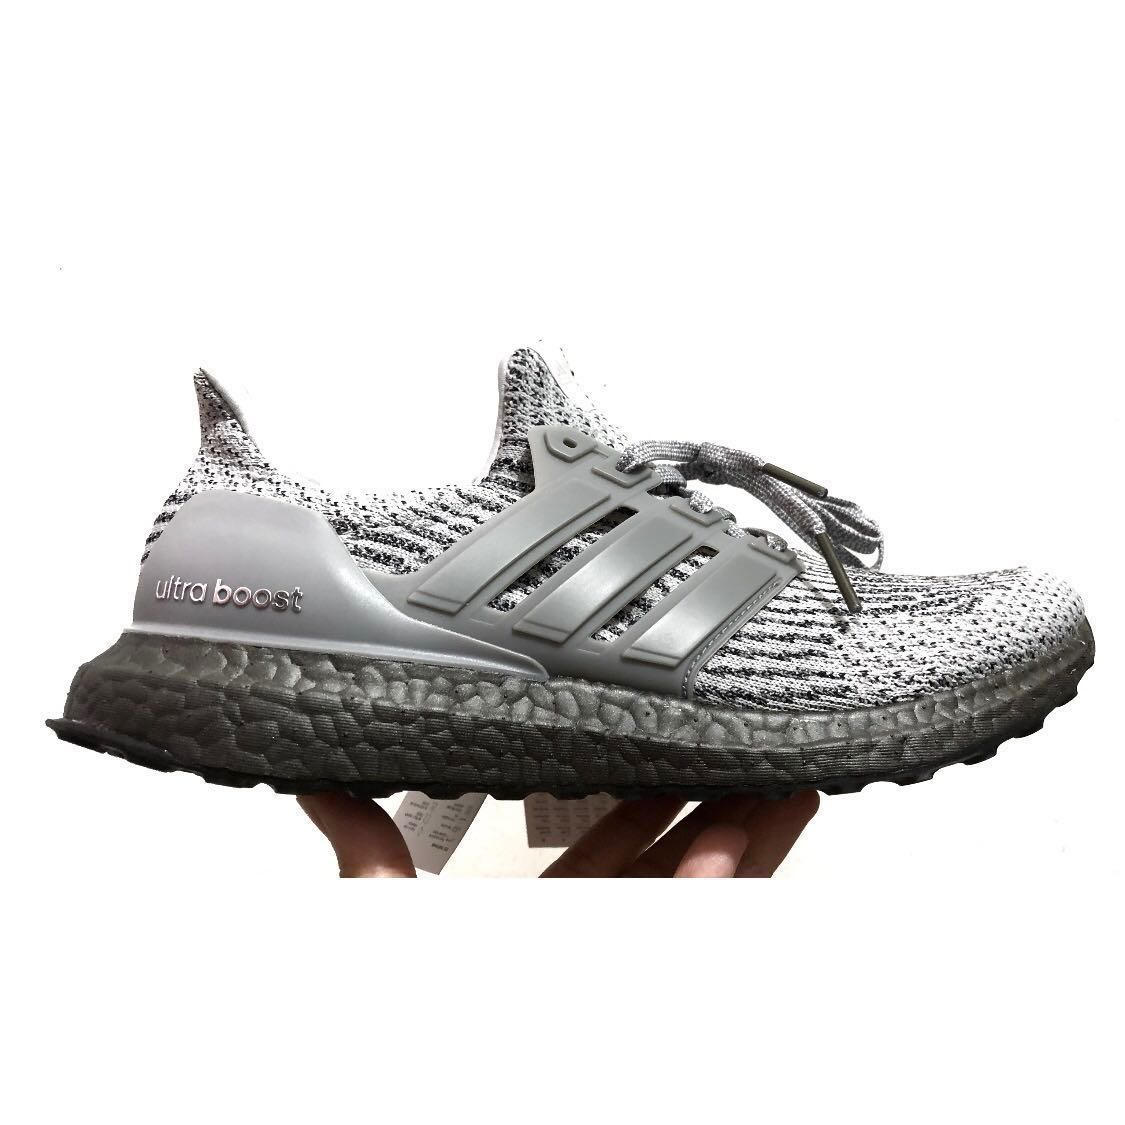 bbf64c2be 🥈UNUSED Adidas Ultraboost 3.0 Triple Grey CG3041